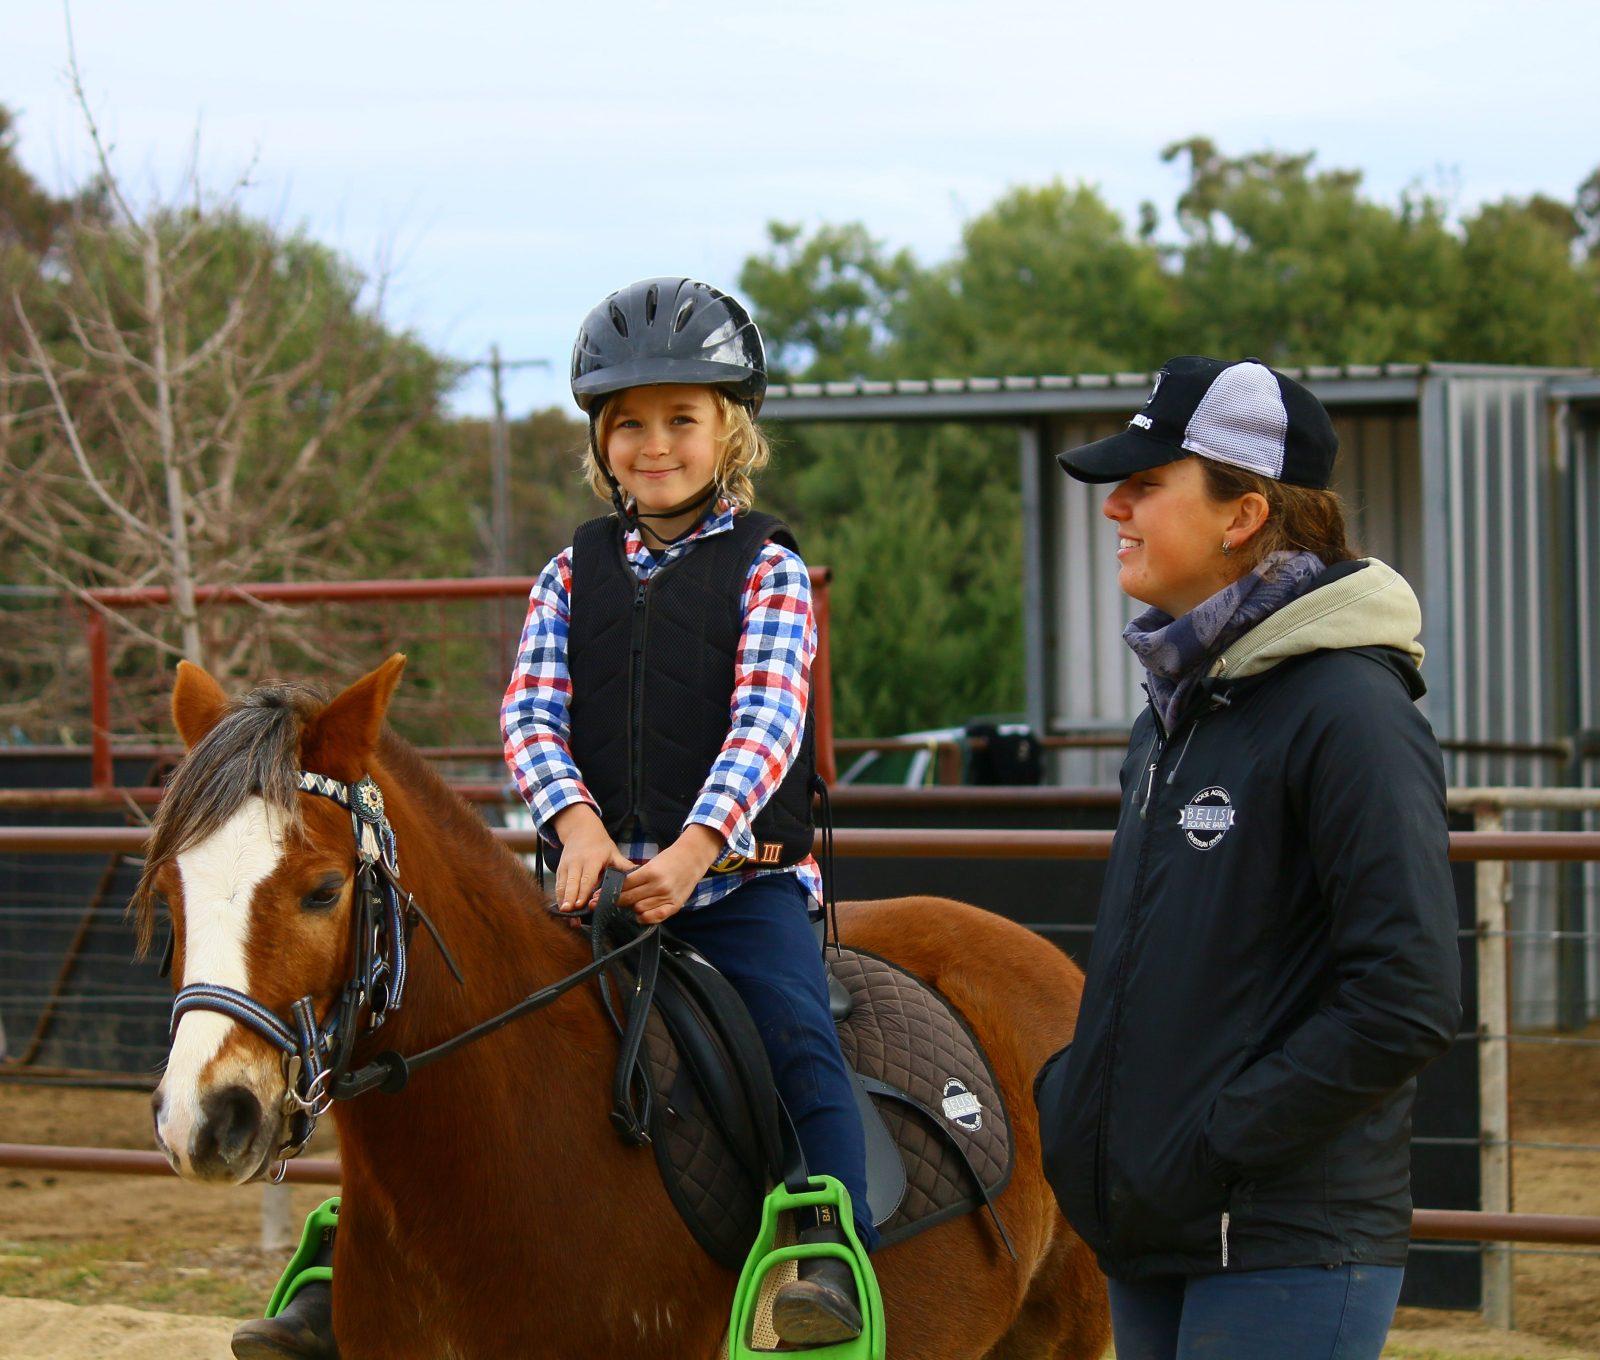 Horse riding at Belisi